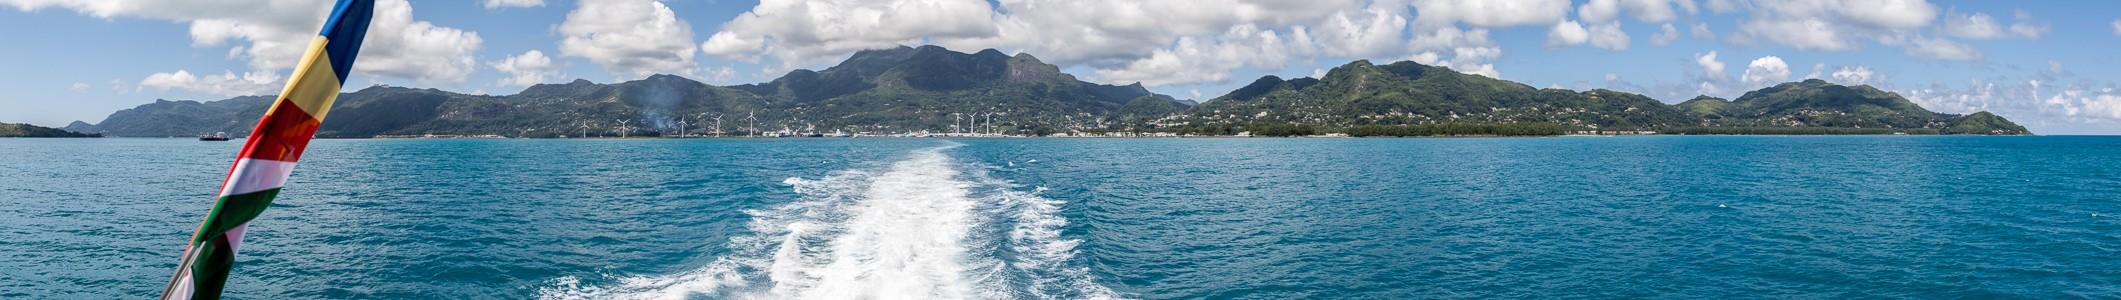 Indischer Ozean Fähre Victoria (Mahé) - Baie Sainte Anne (Praslin): Mahé